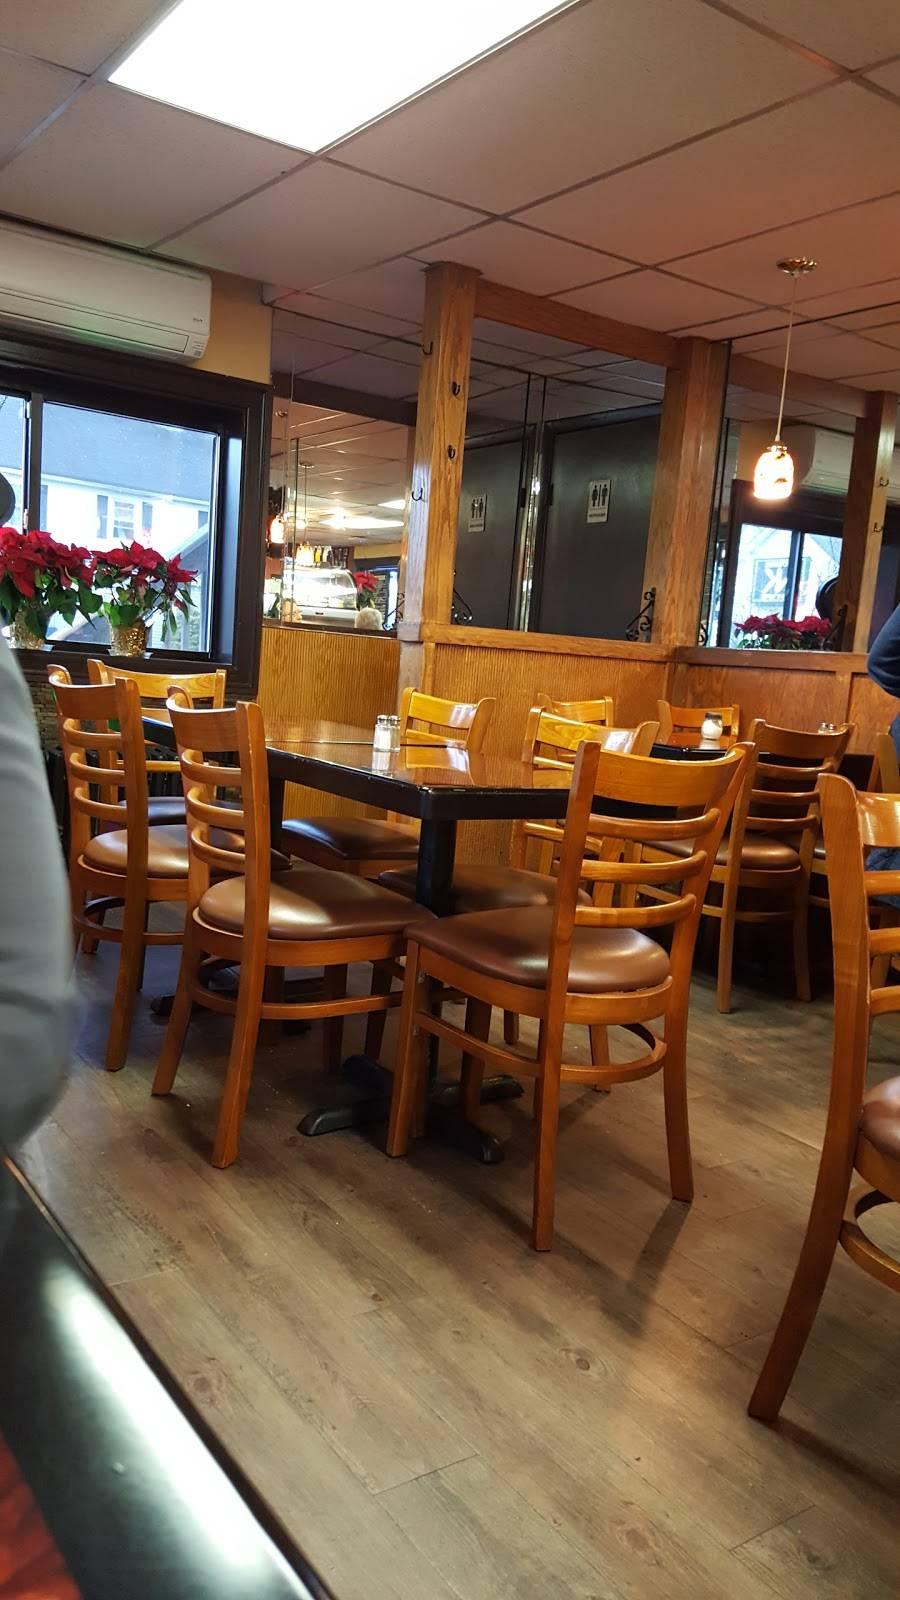 Marias Pizzeria & Restaurant | restaurant | WE DELIVER, 49 N Main St, Wharton, NJ 07885, USA | 9733664790 OR +1 973-366-4790